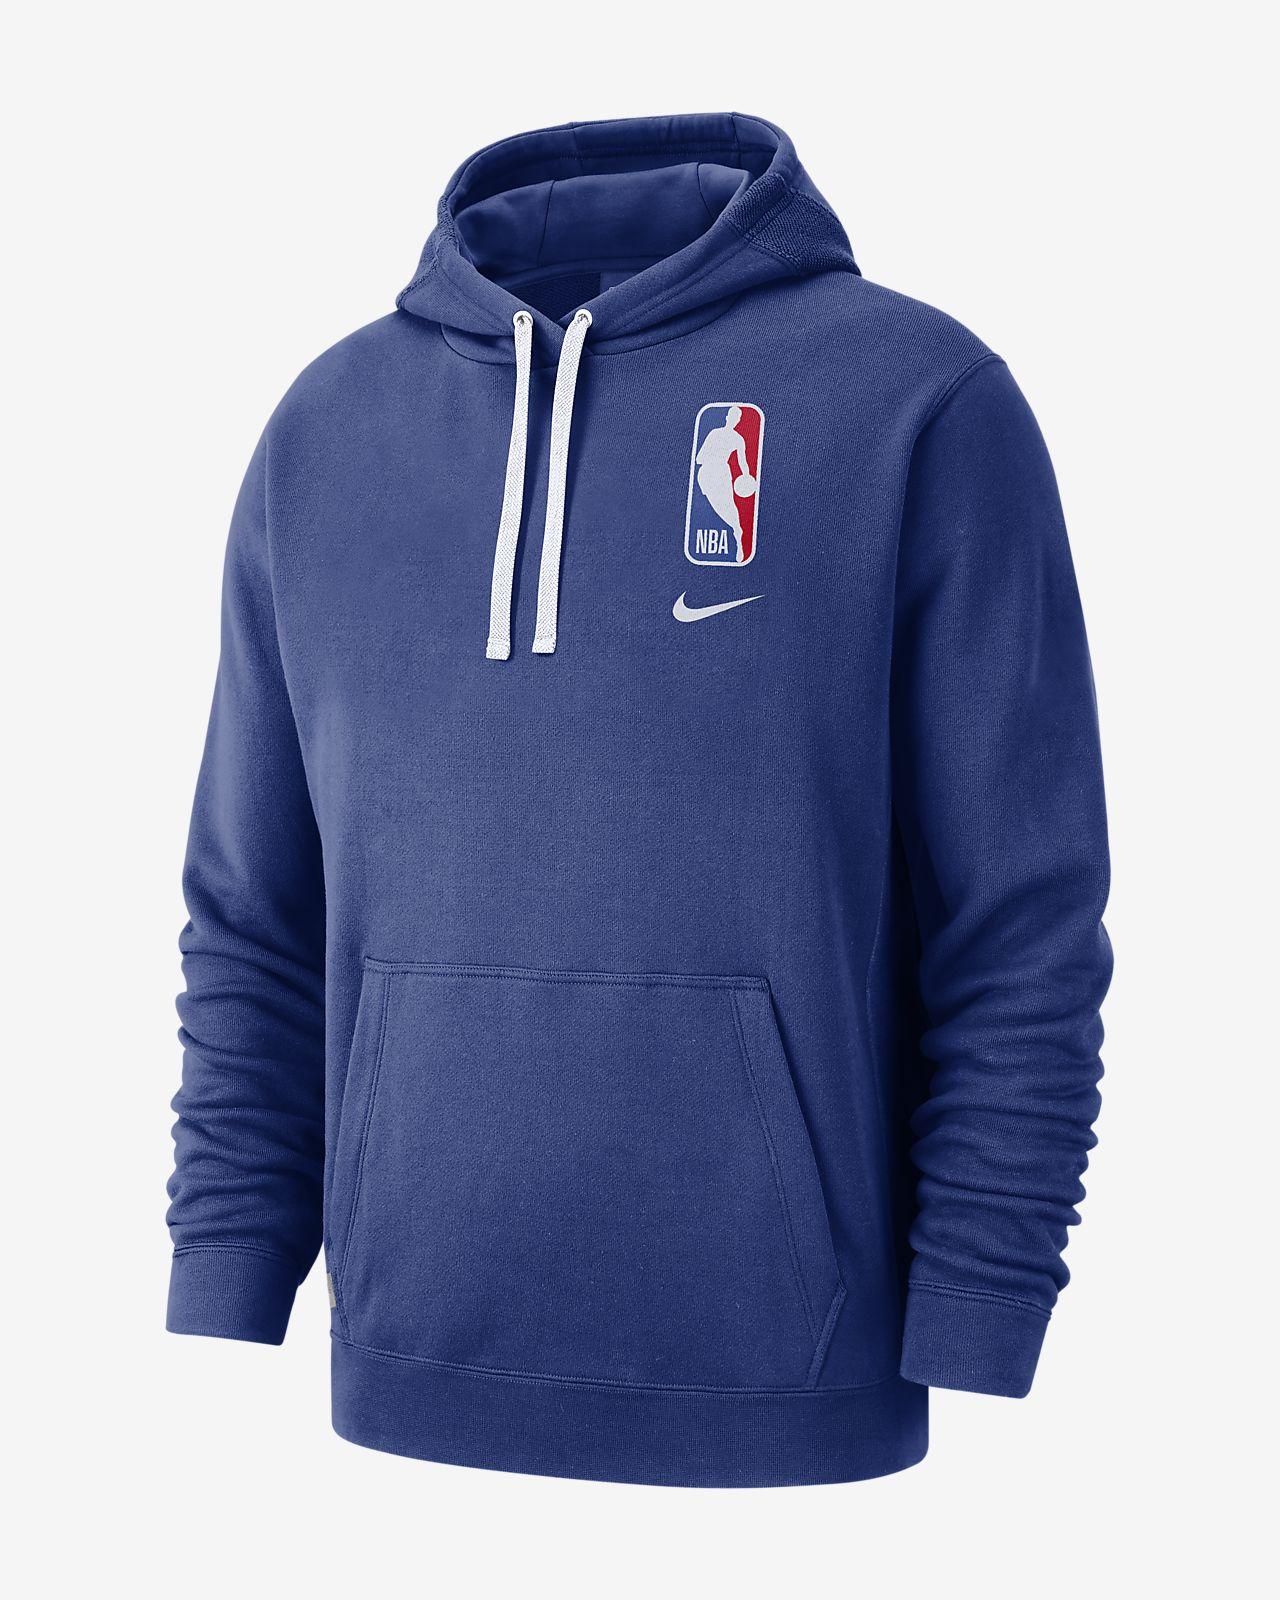 Nike NBA-hoodie voor heren